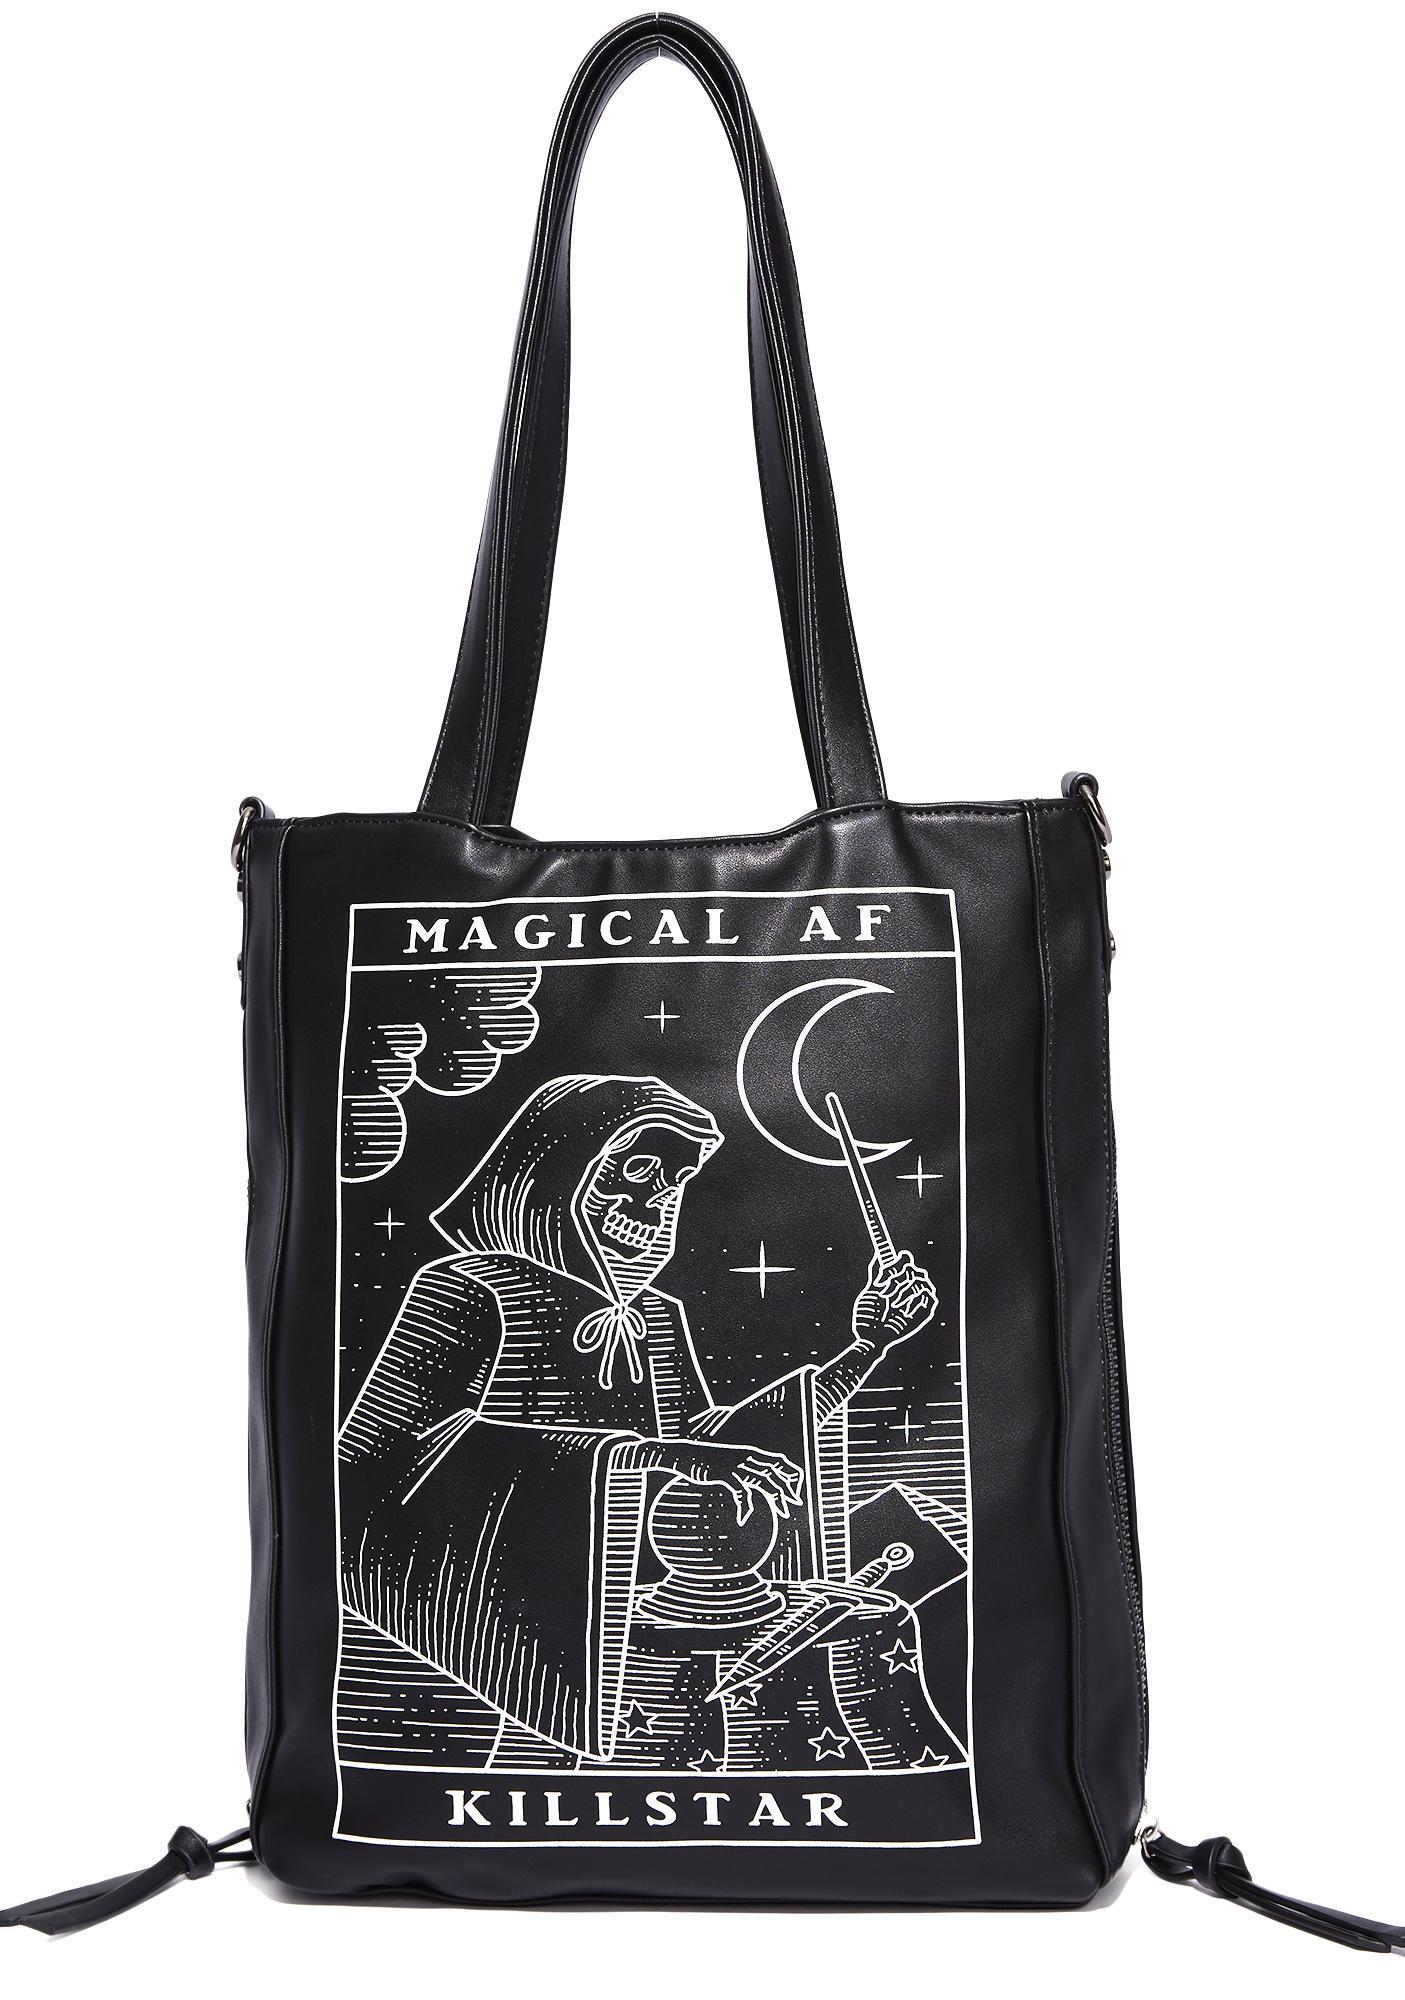 Killstar Magical AF Shopper Tote